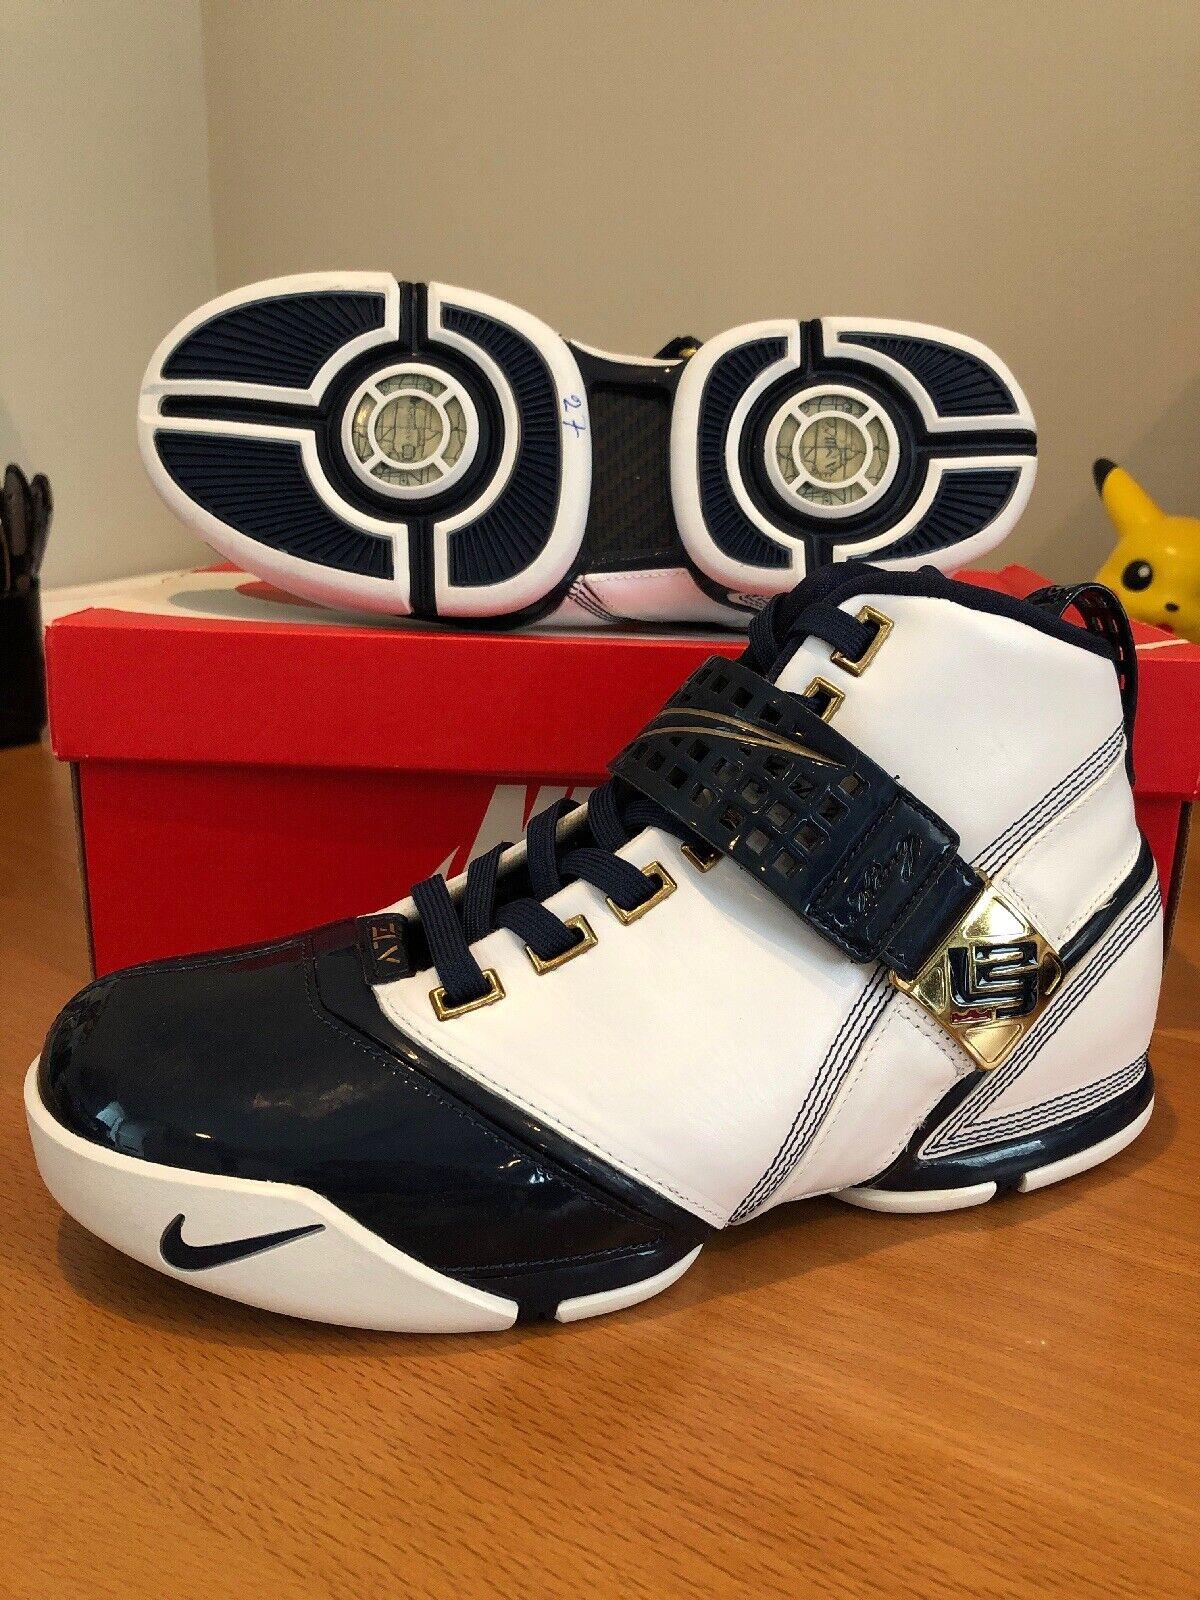 Nuevo Nike LeBron V 5 Zoom Original Air Olympics 2007 Akron King James oro Penny Talla 9.5